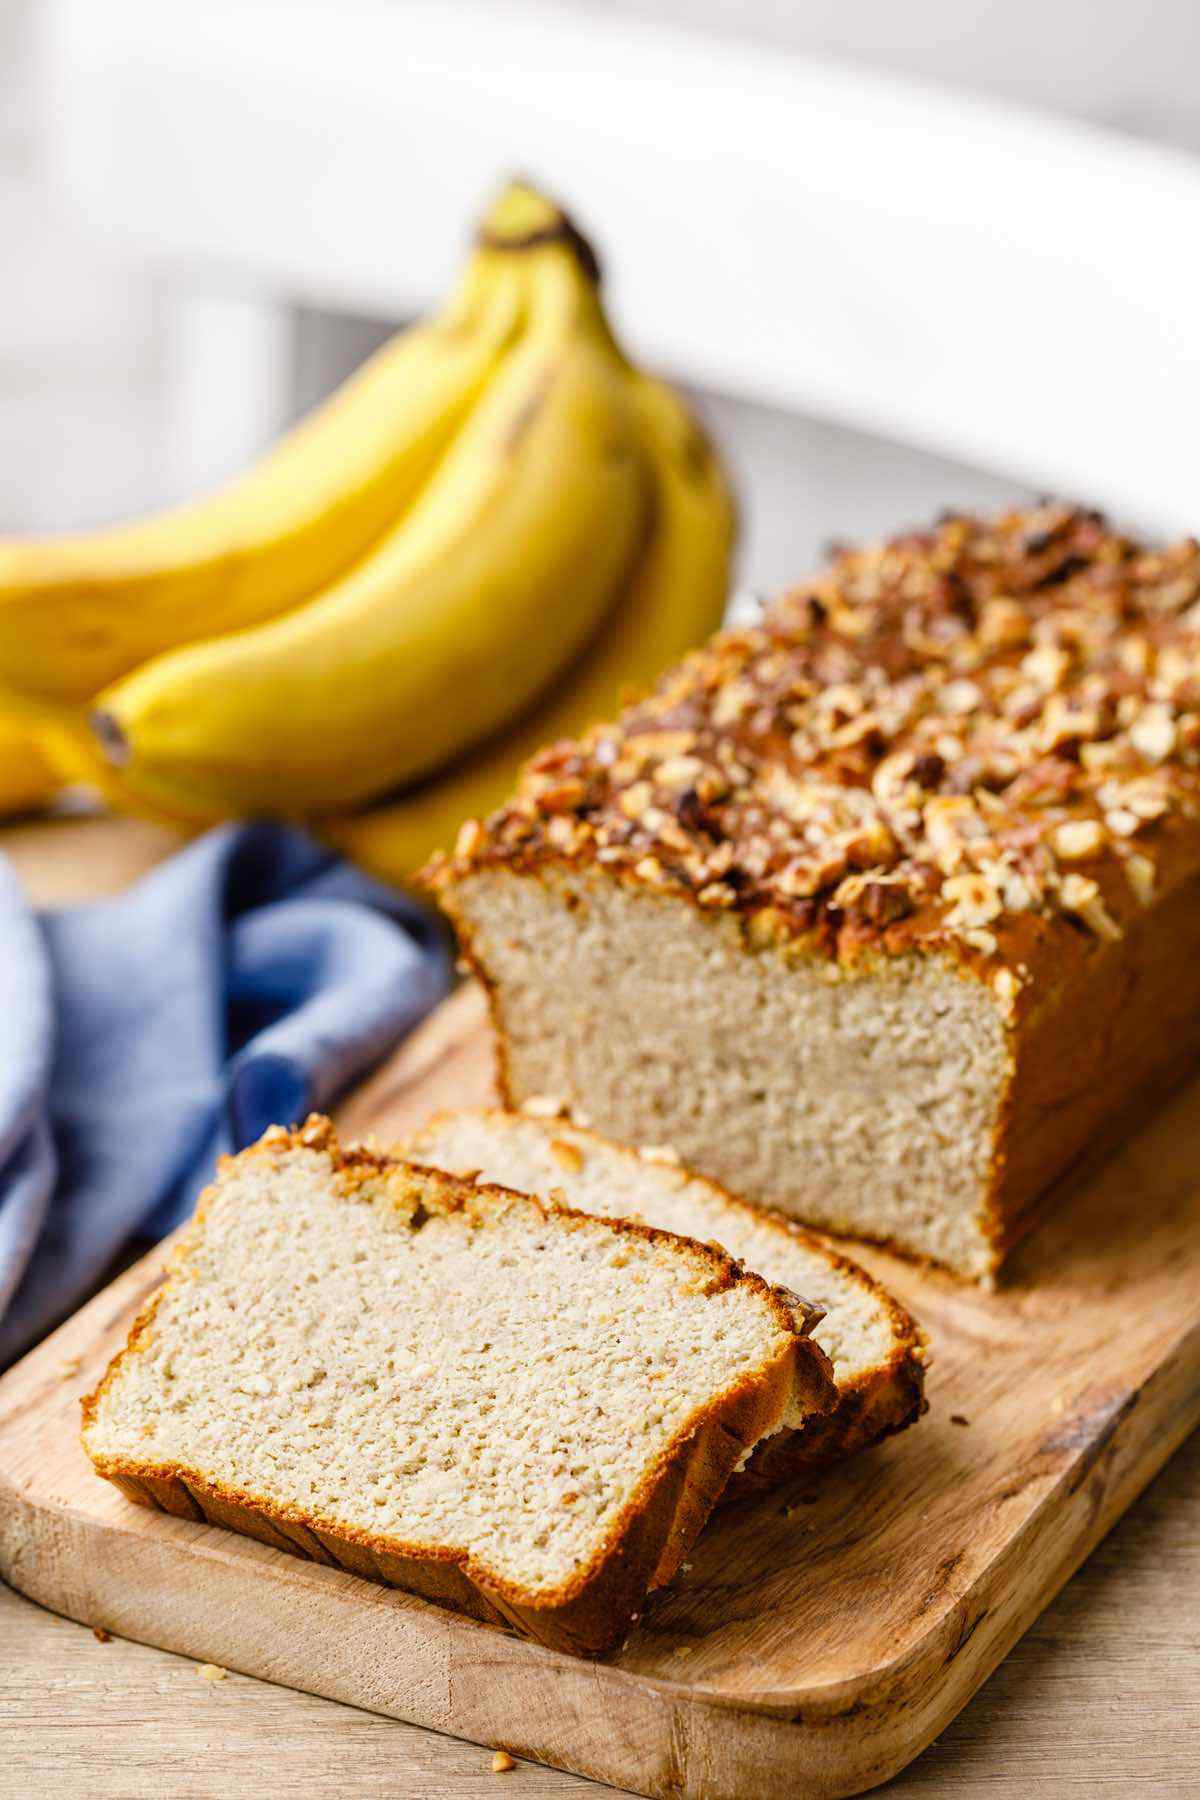 Keto Banana Bread Videos  The Best Keto Banana Nut Bread Ever My Kids Love This